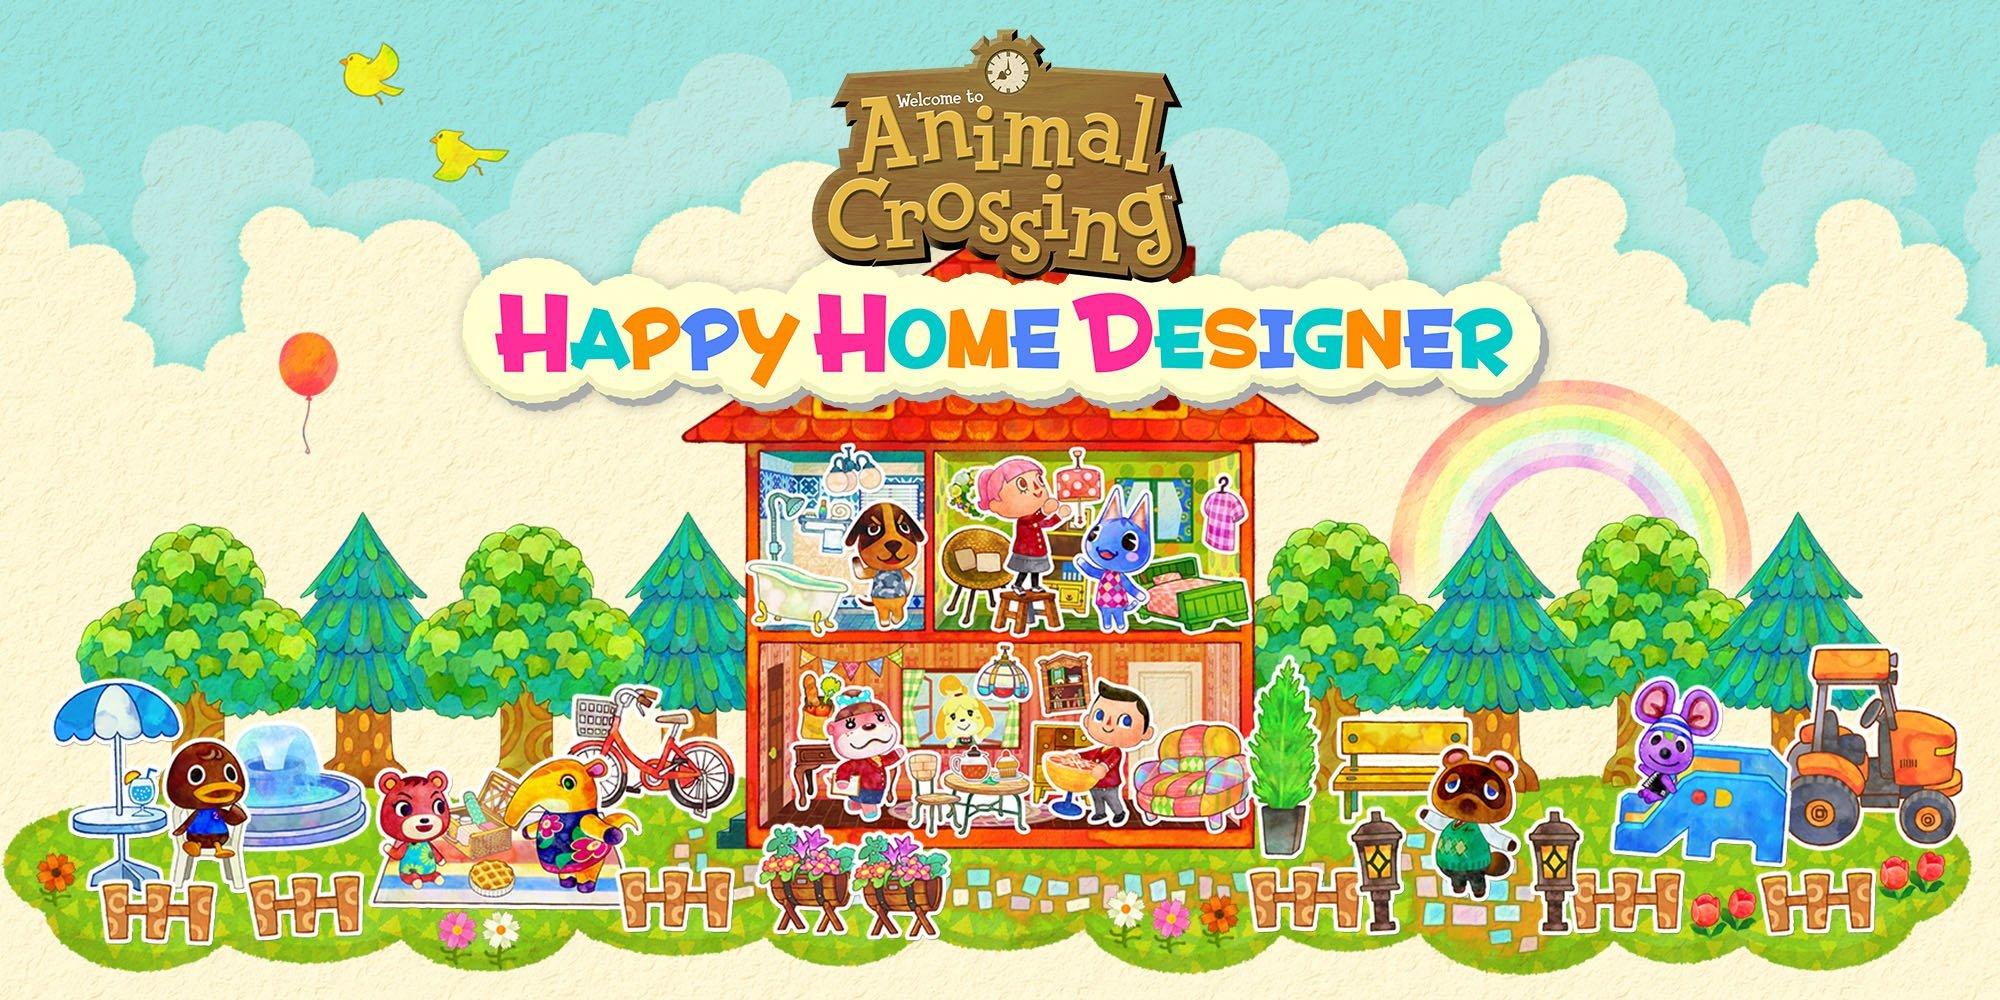 Modojo | Monster Hunter Items are Coming to Animal Crossing: Happy Home Designer